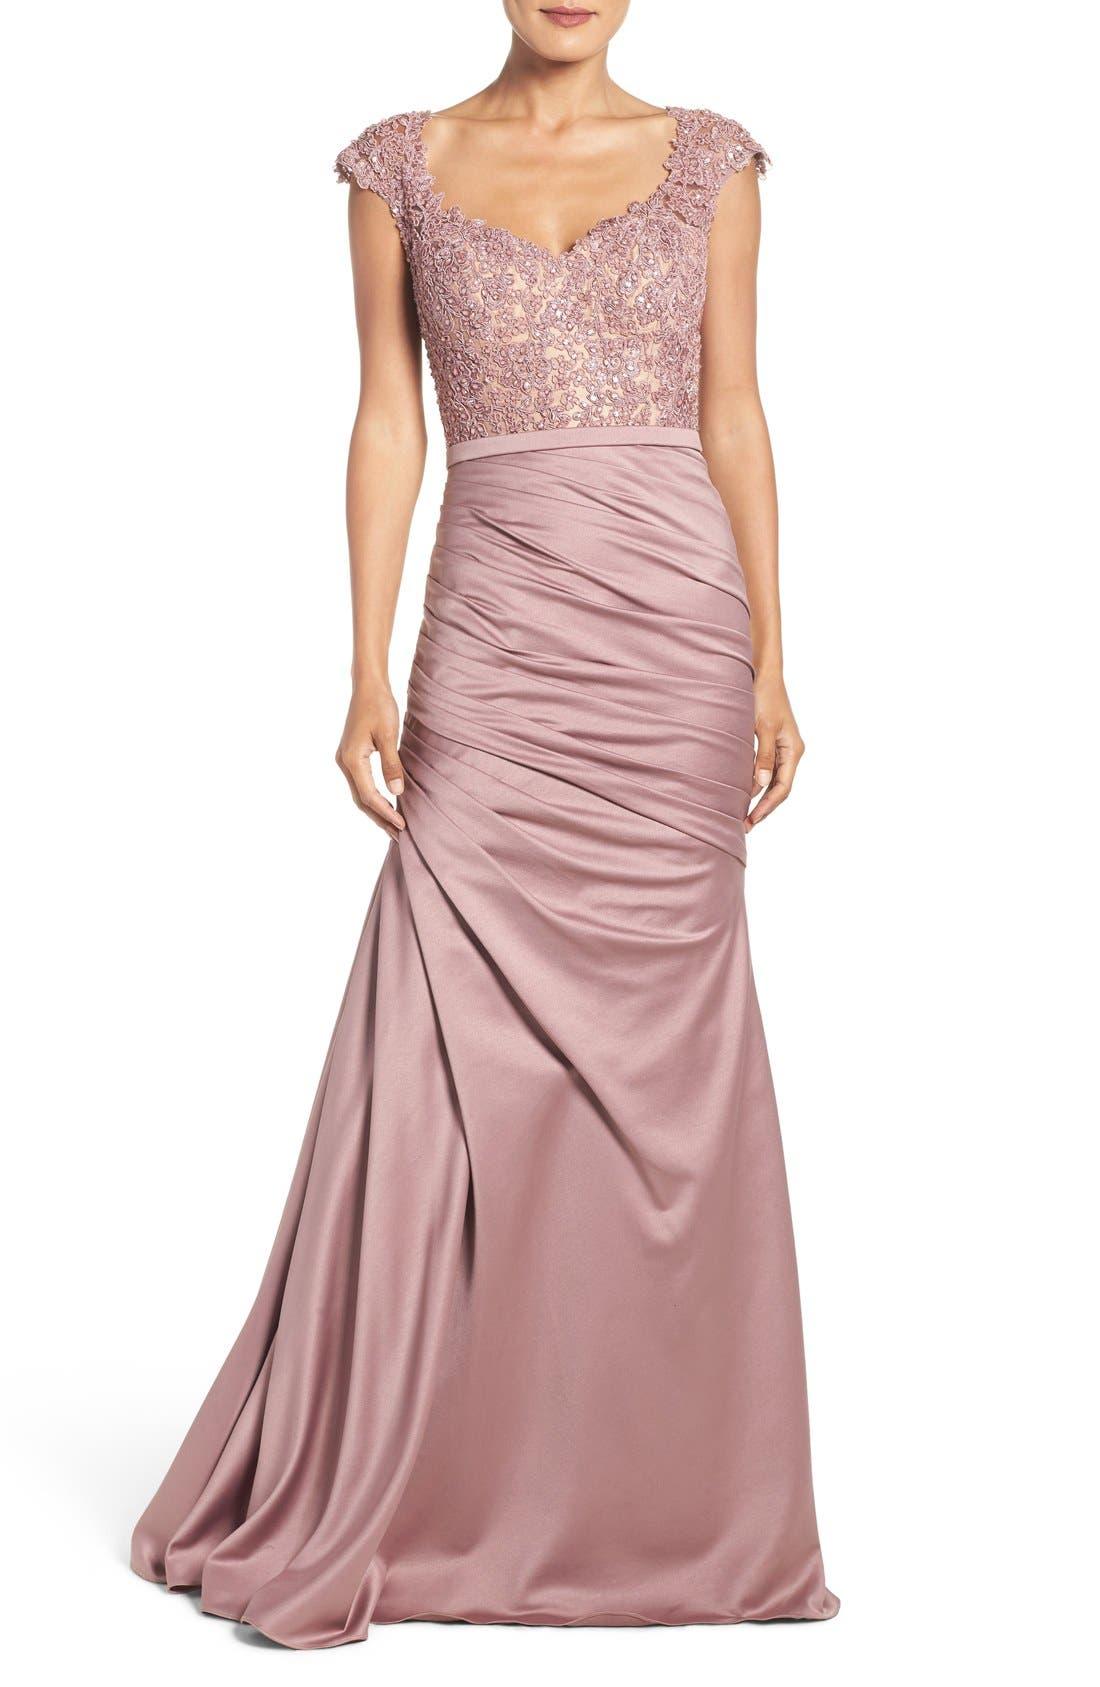 La Femme Embellished Lace & Satin Mermaid Gown, Pink